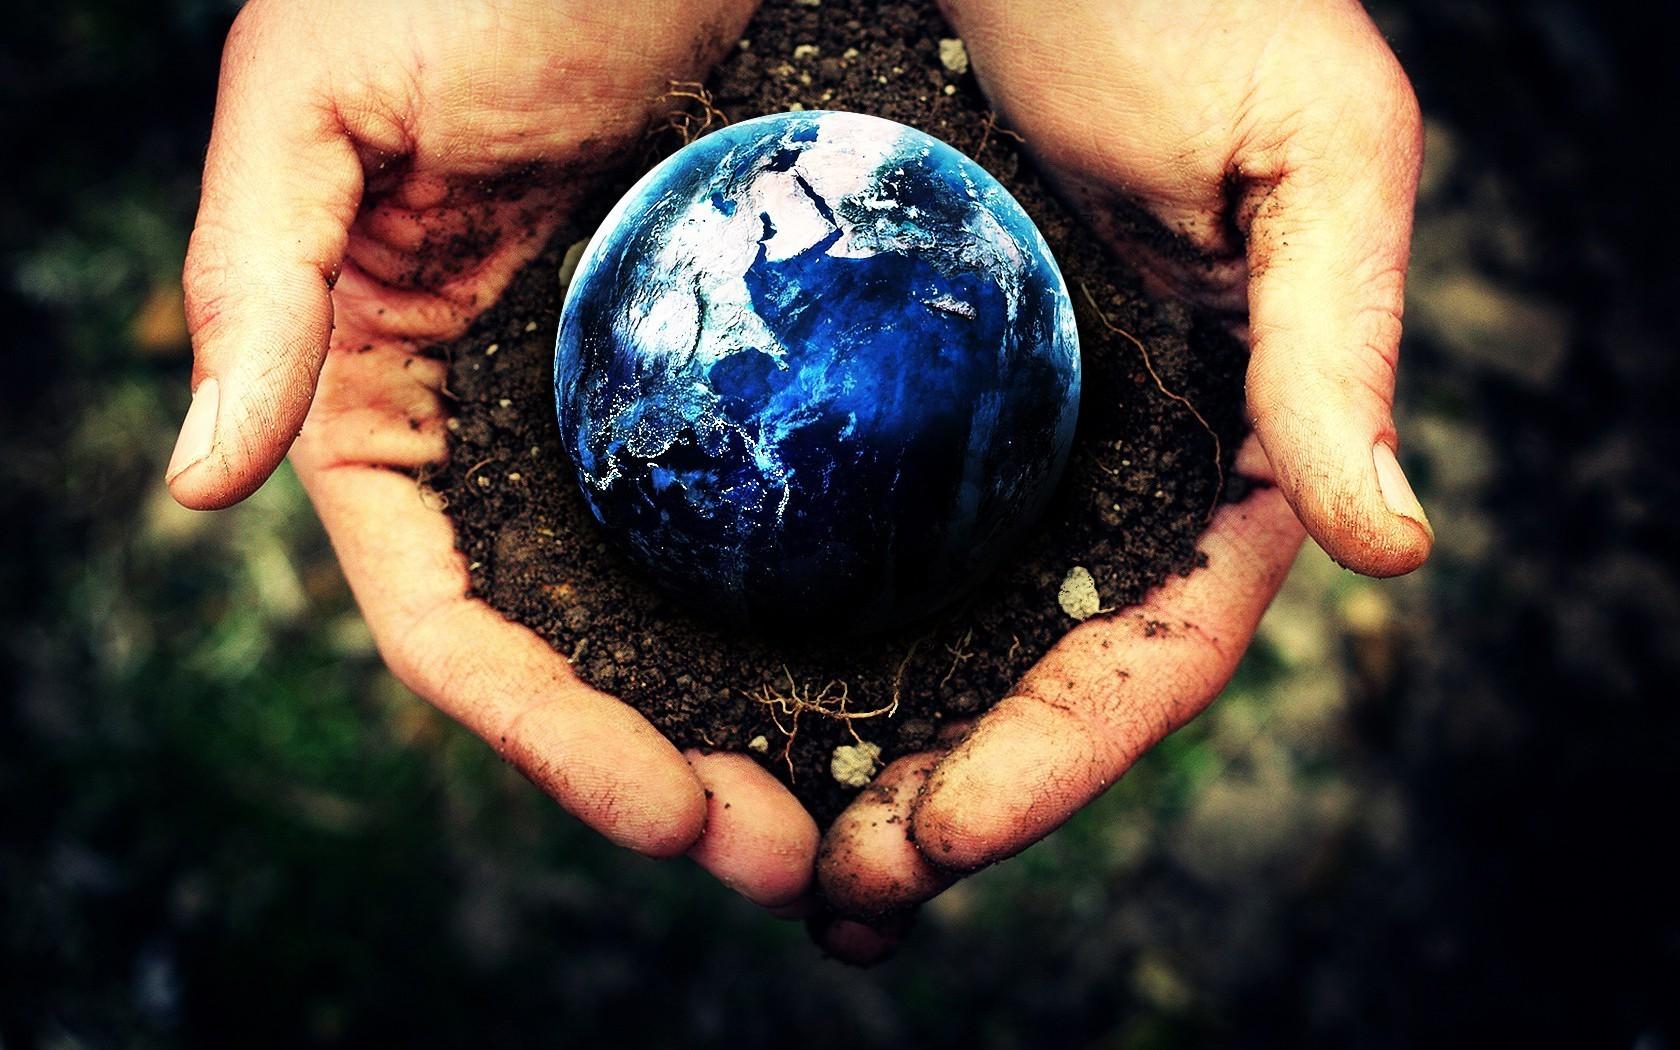 162135-Earth-planet-hand-photo_manipulation-dirt.jpg